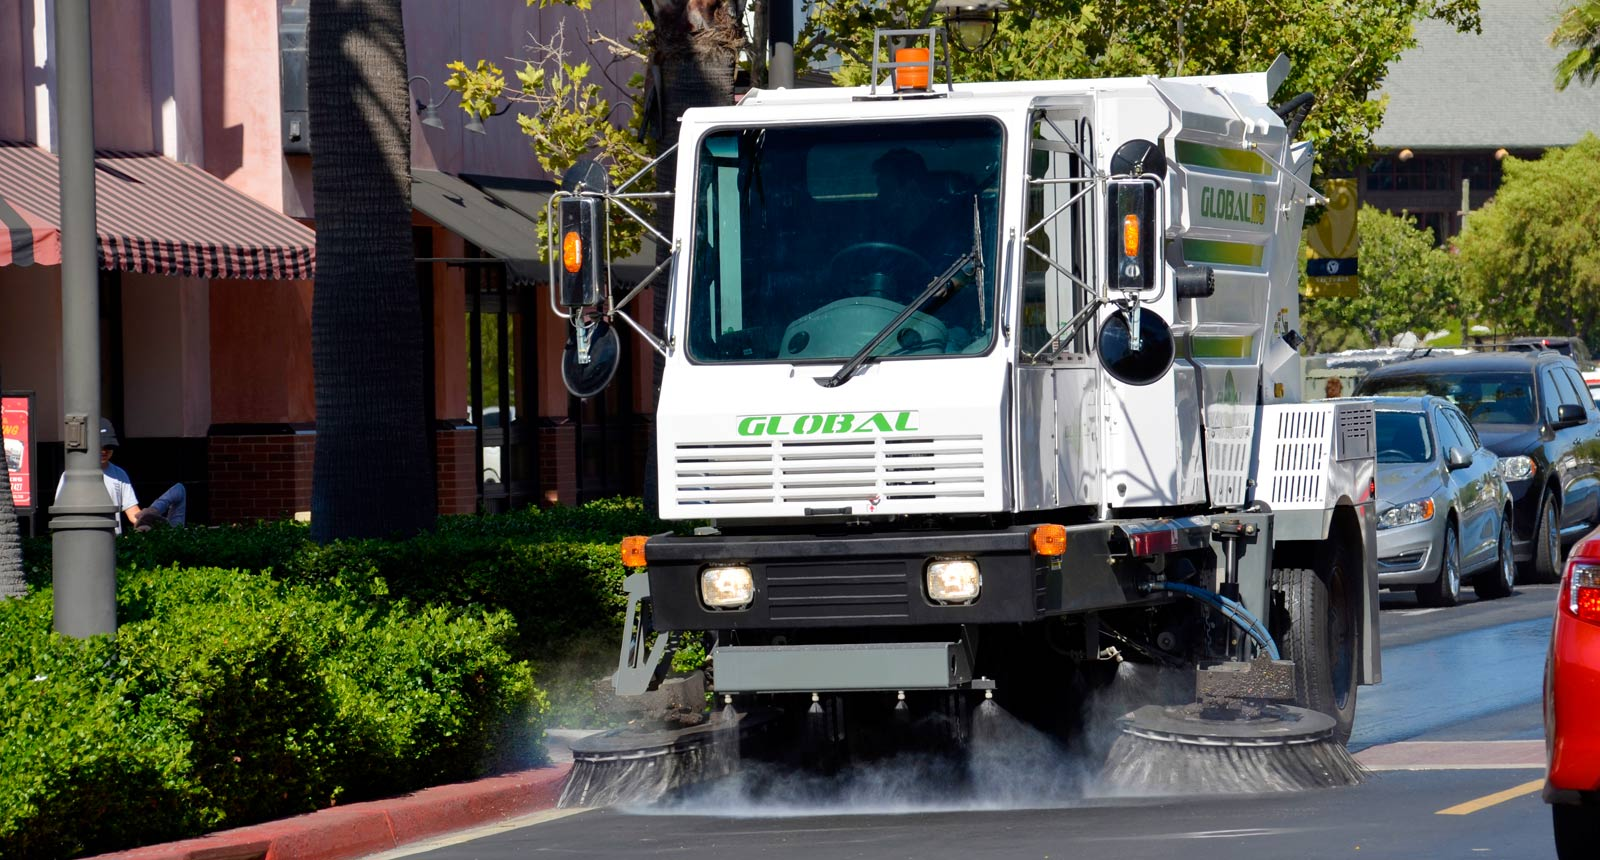 Global M3 Street Sweeper Dust Control